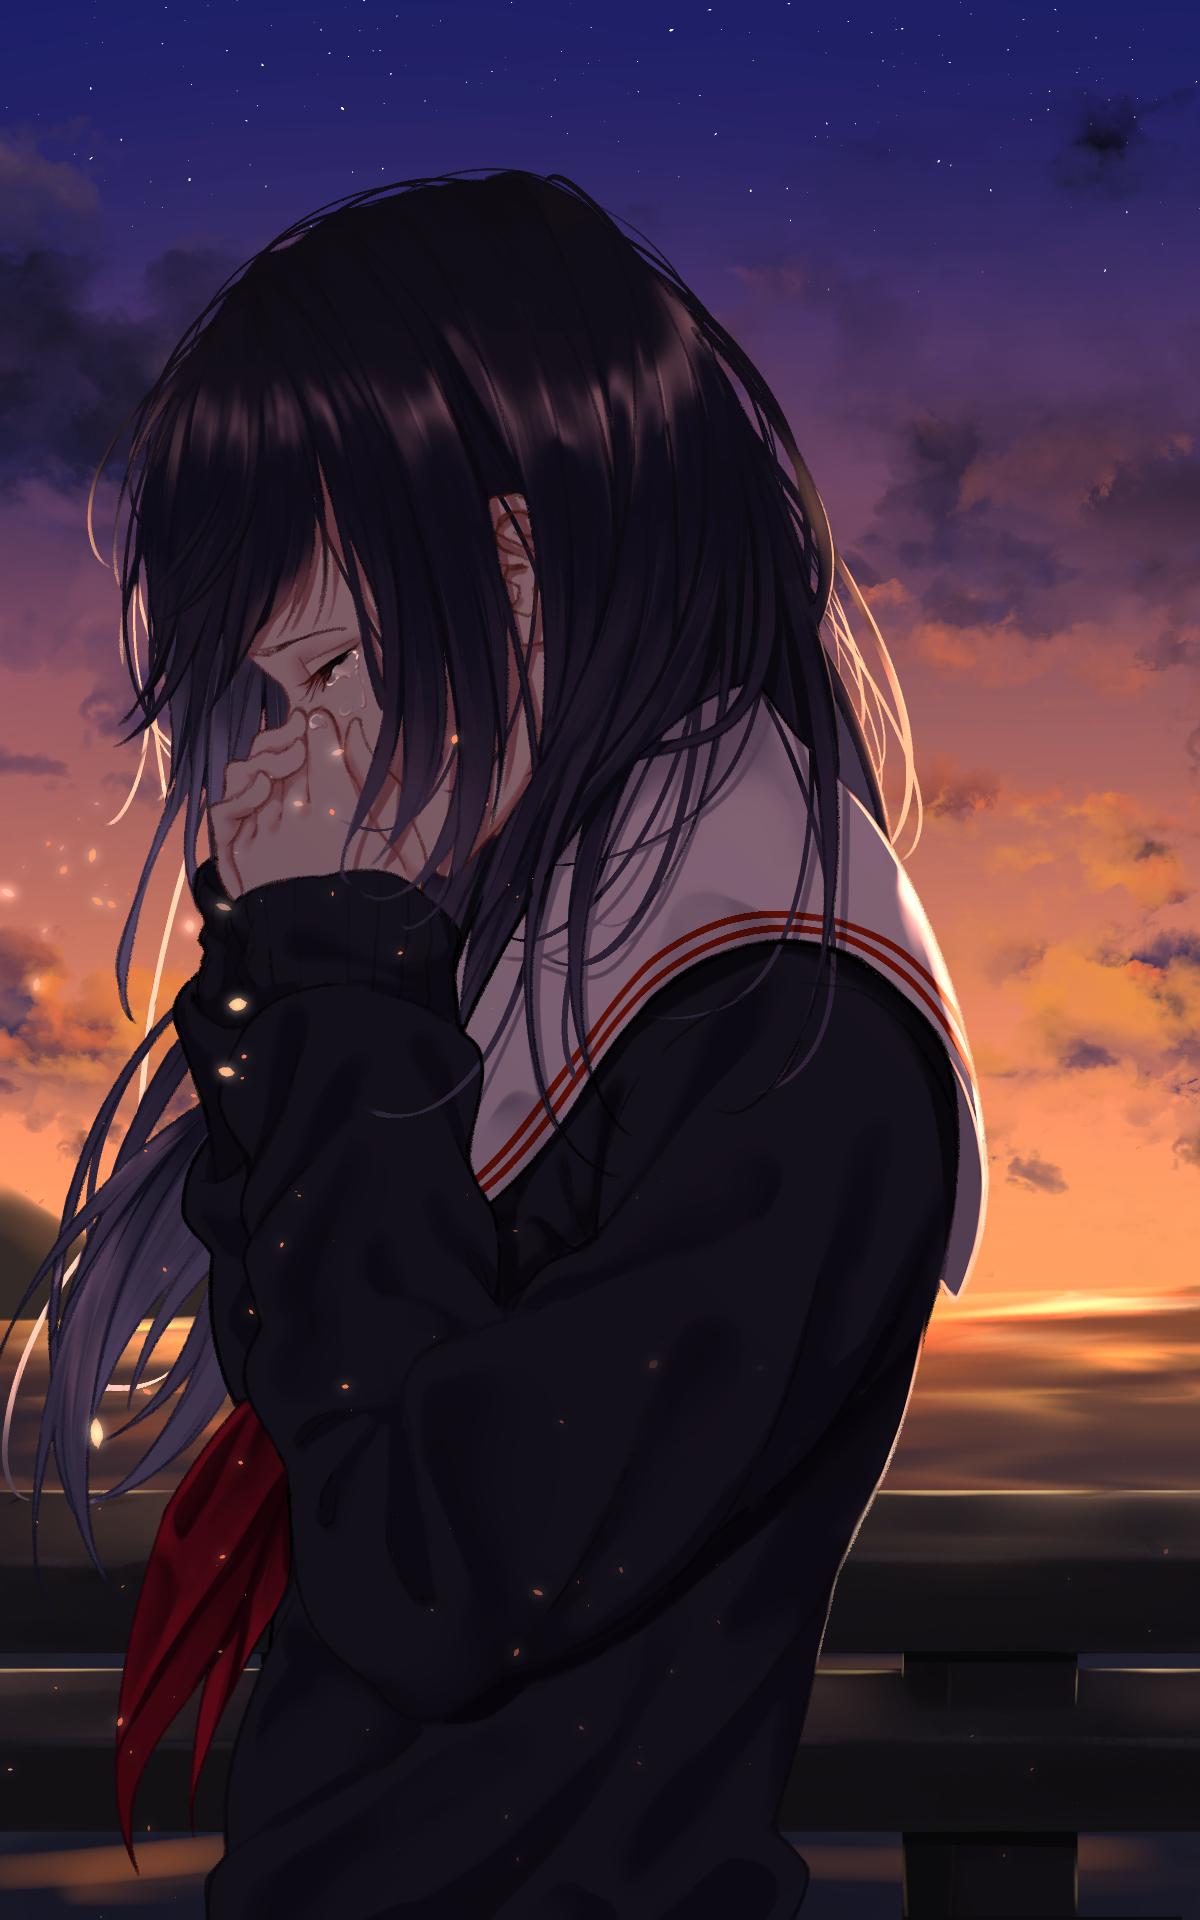 Wow 14 Gambar Anime Keren 3d Sedih Https Ift Tt 2yoalxw Di 2020 Manga Anime Gambar Kehidupan Gambar Anime